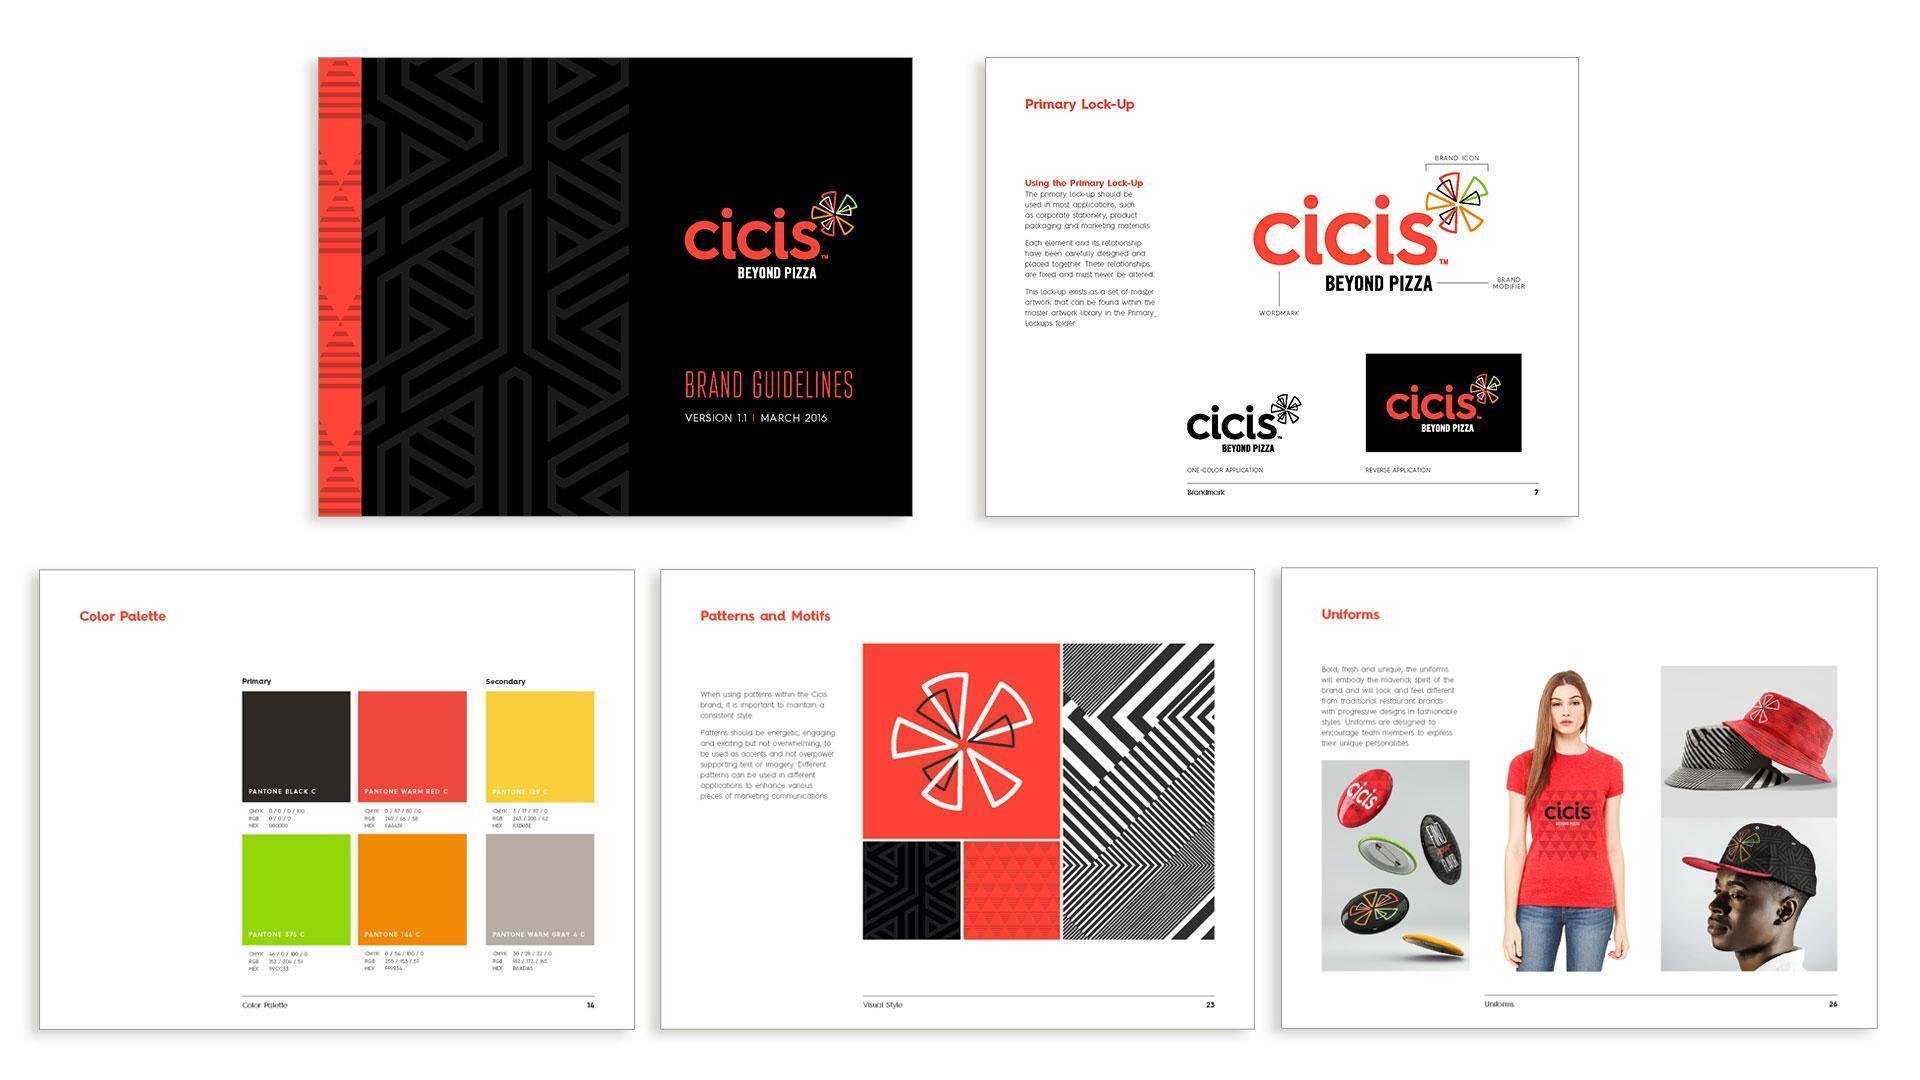 cicis-brand-identity-brand-guidelines